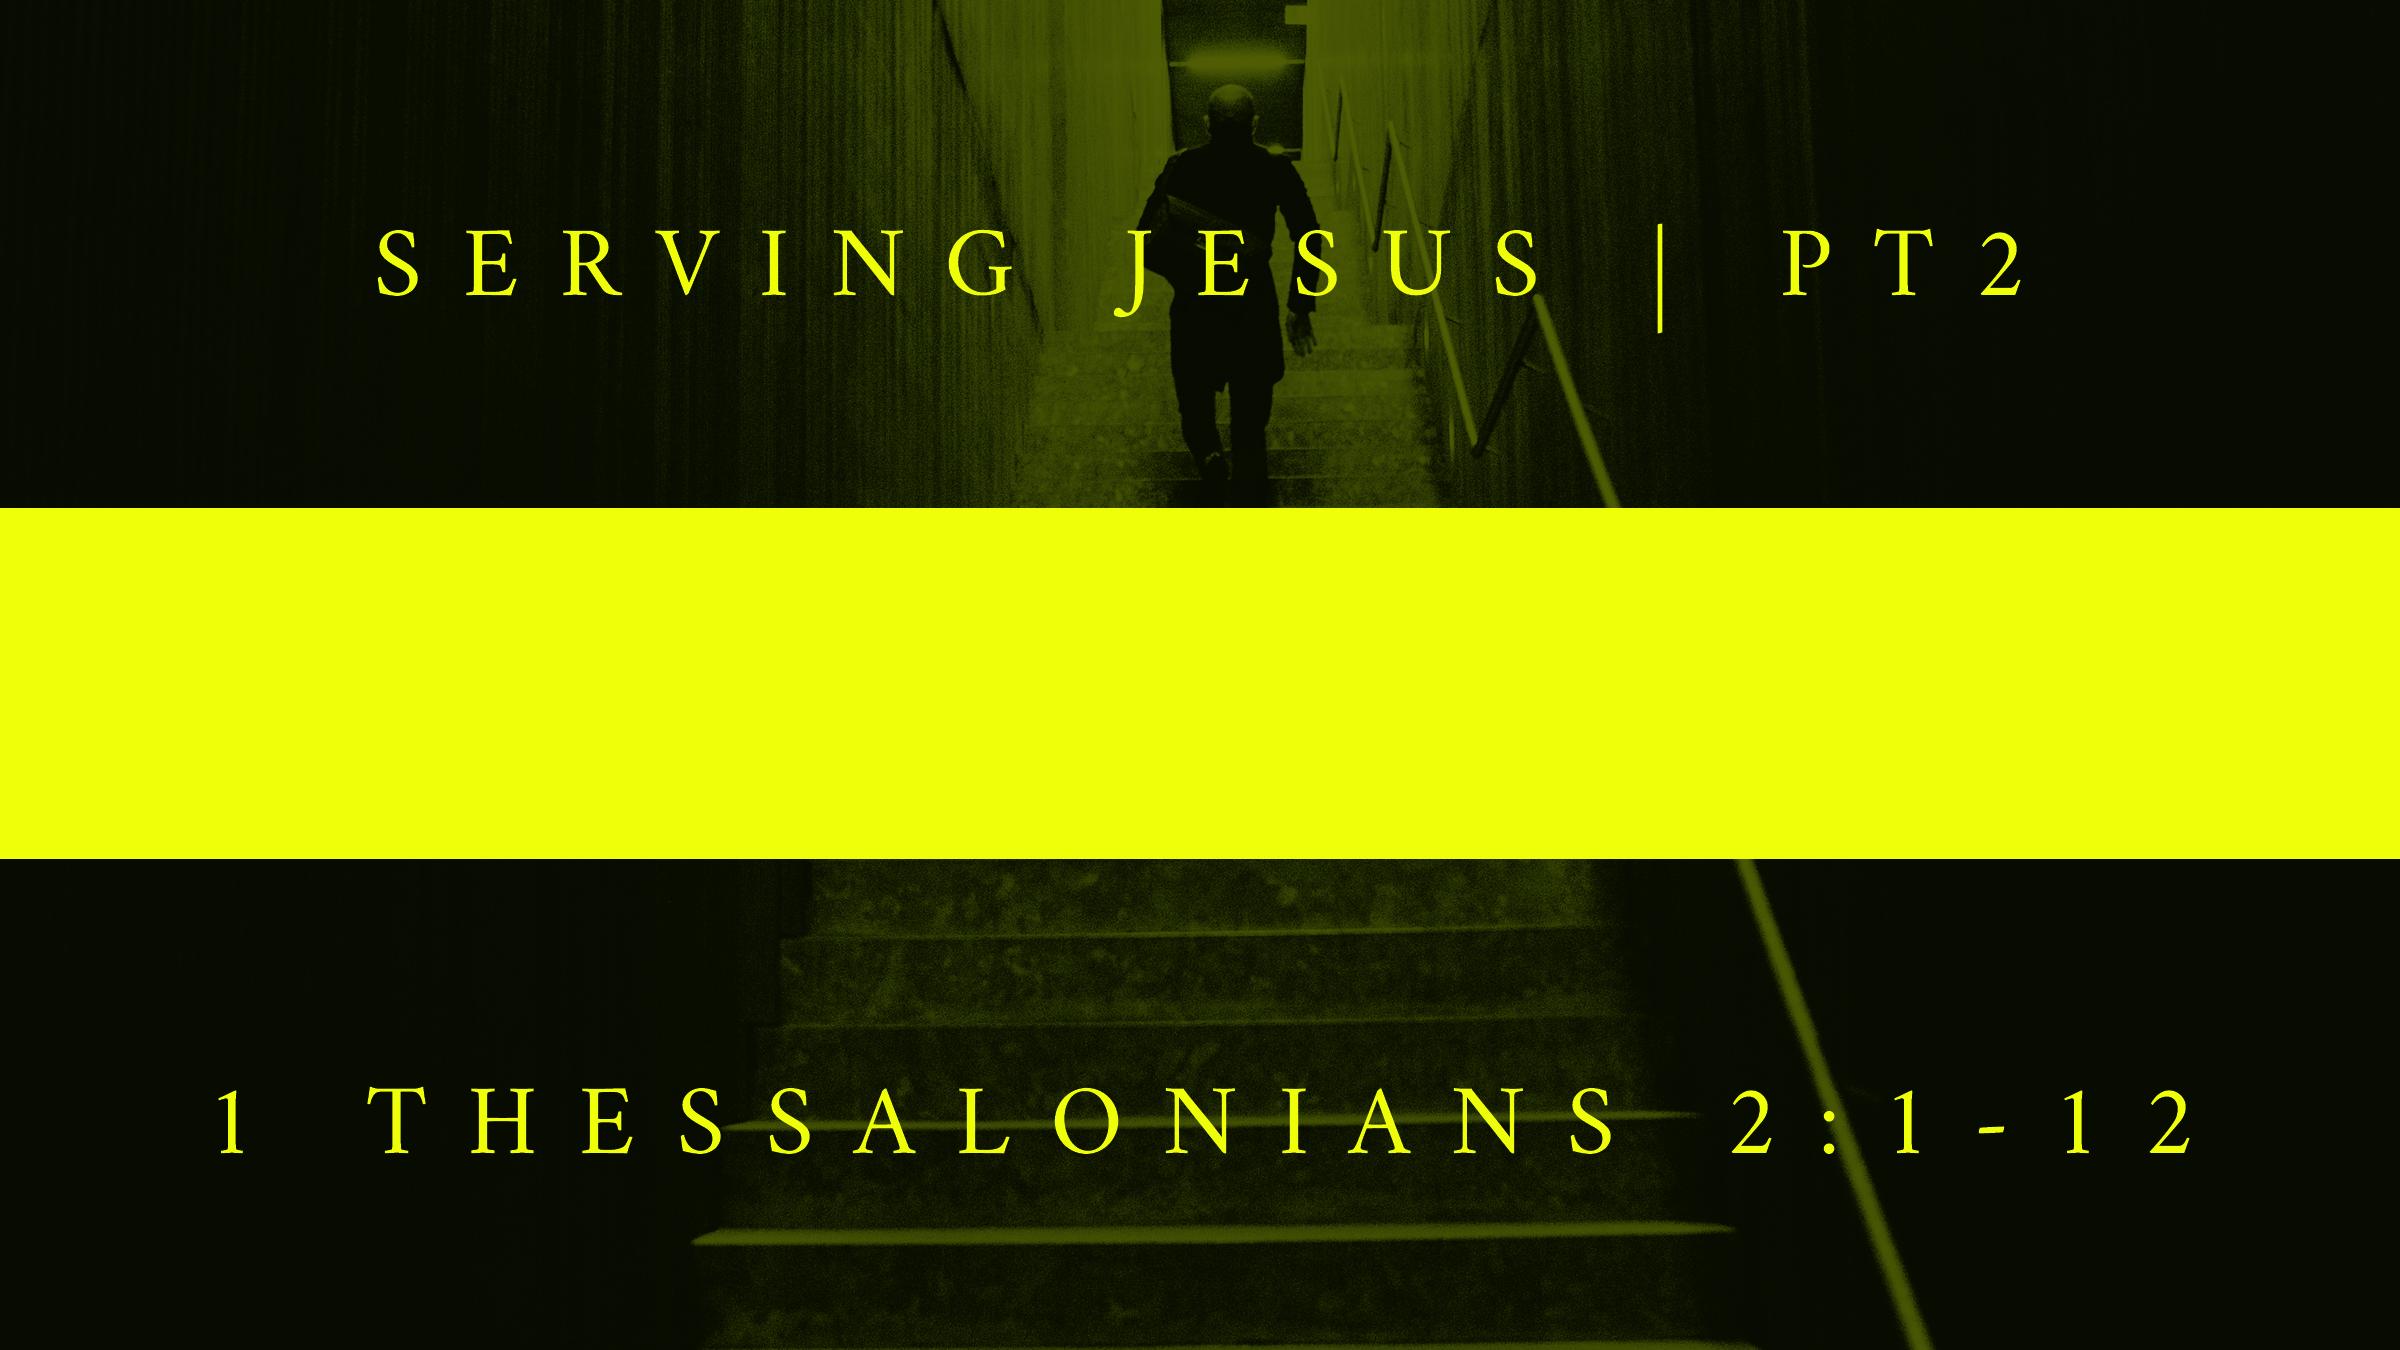 Serving Jesus - pt2.jpg